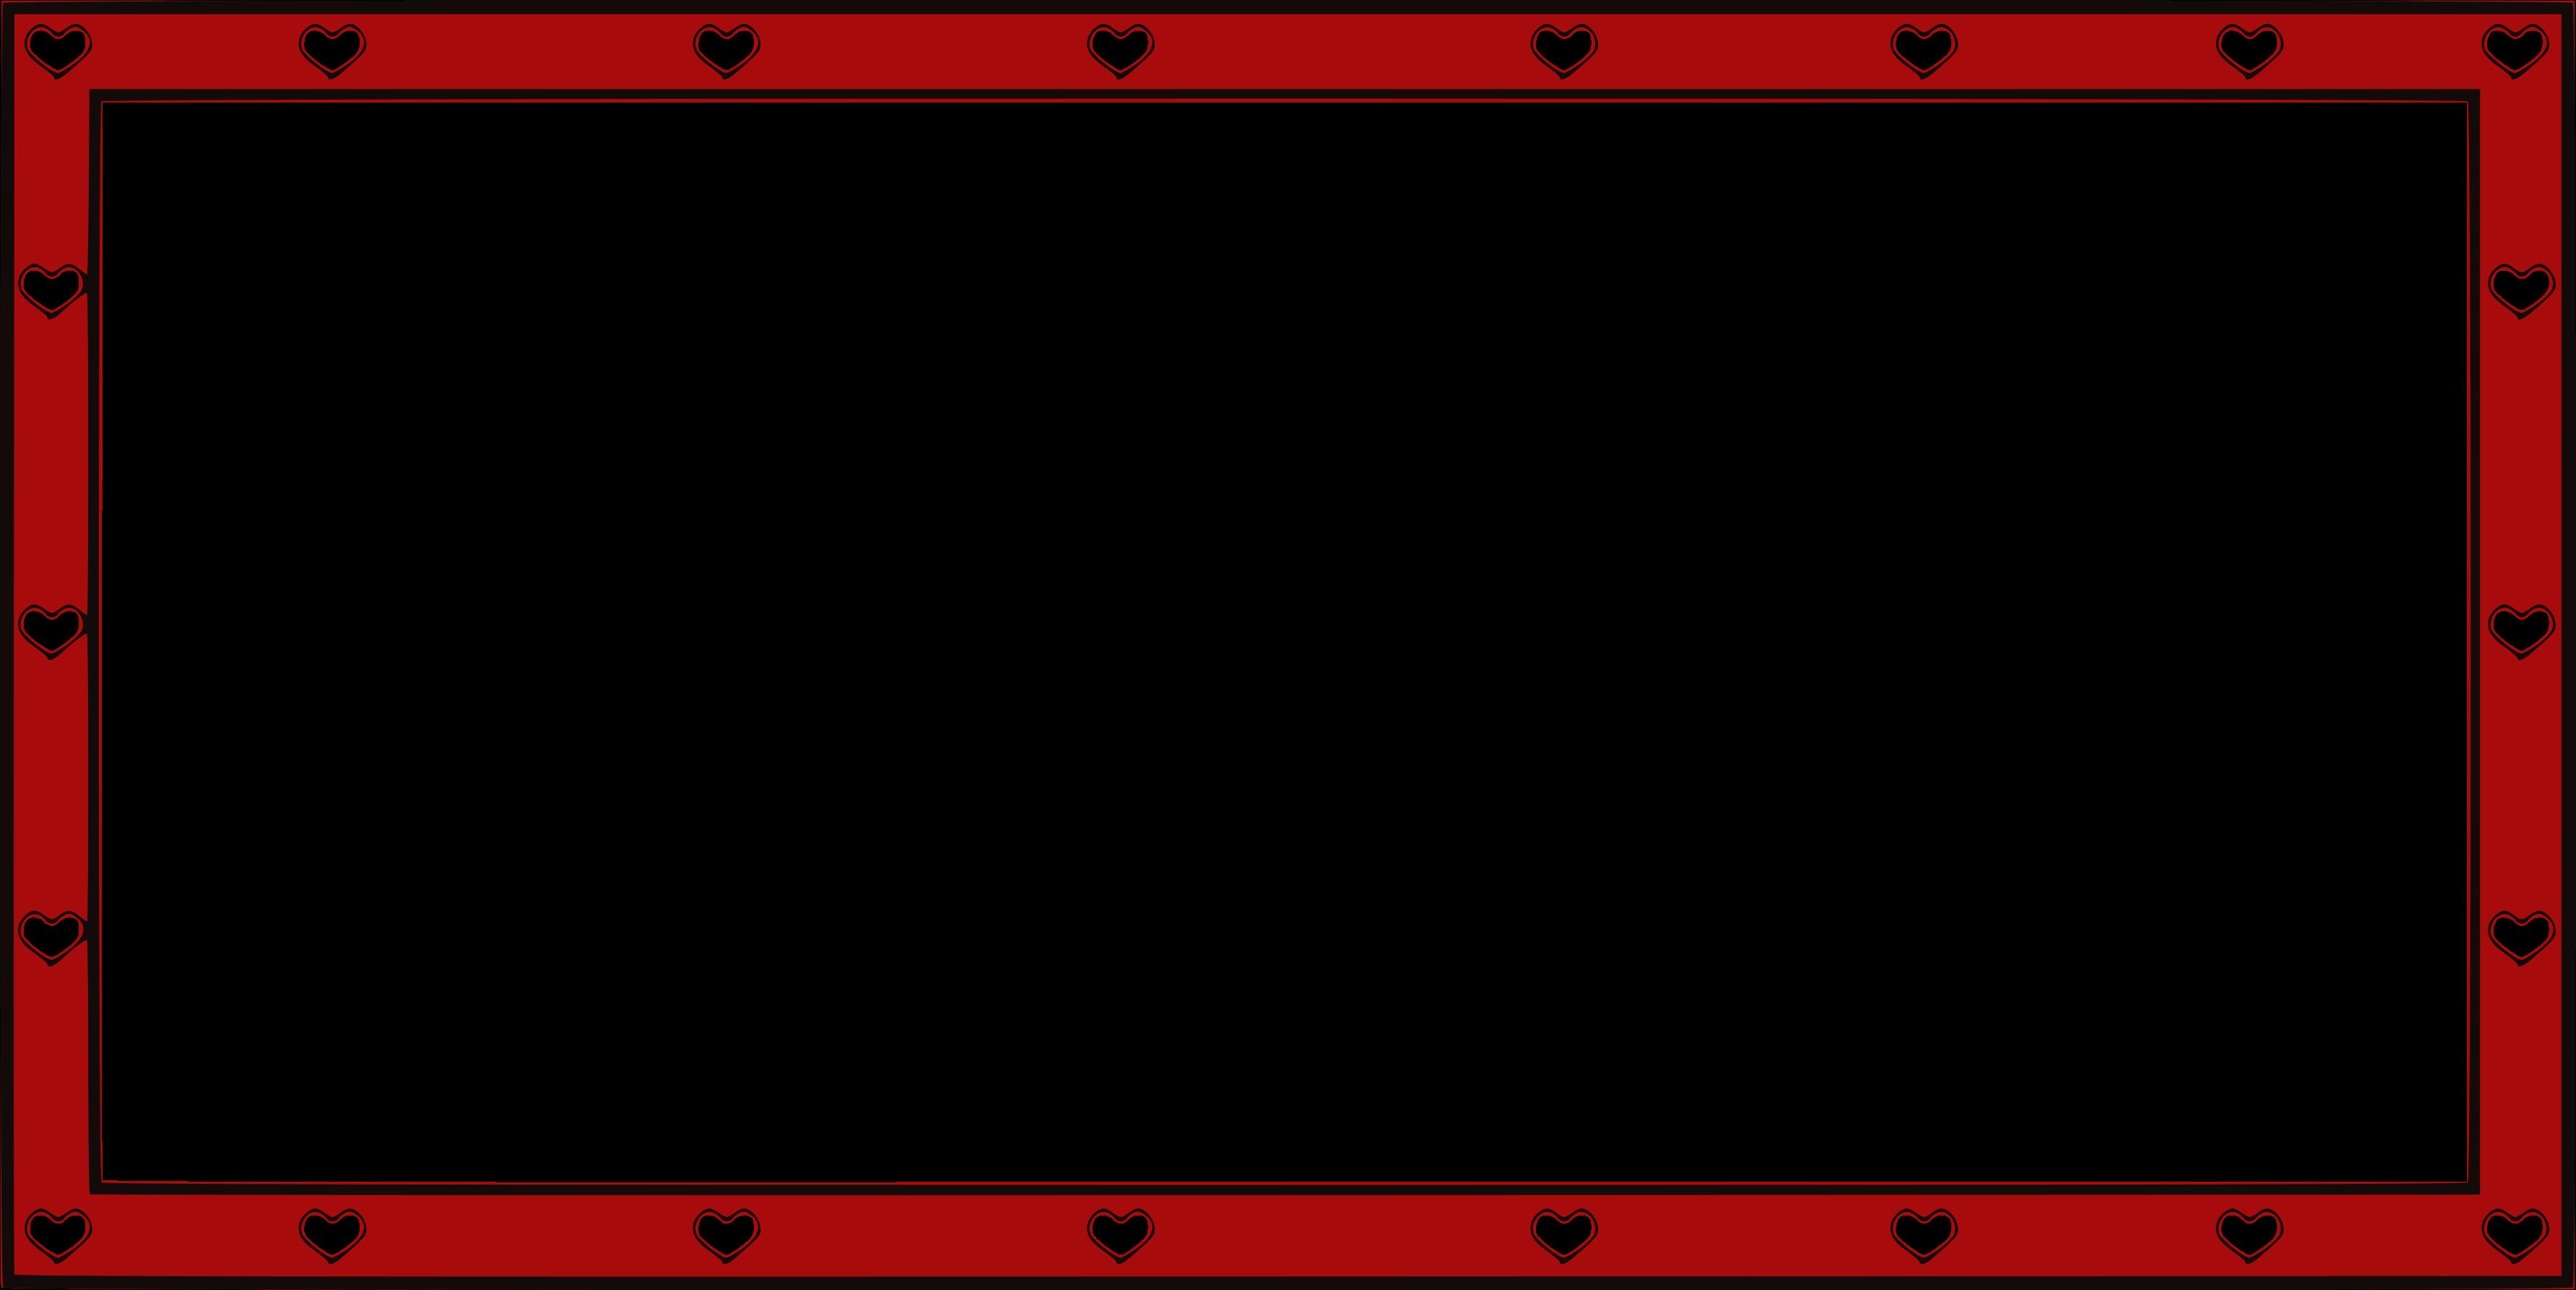 Red heart frame border - Photopublicdomain.com